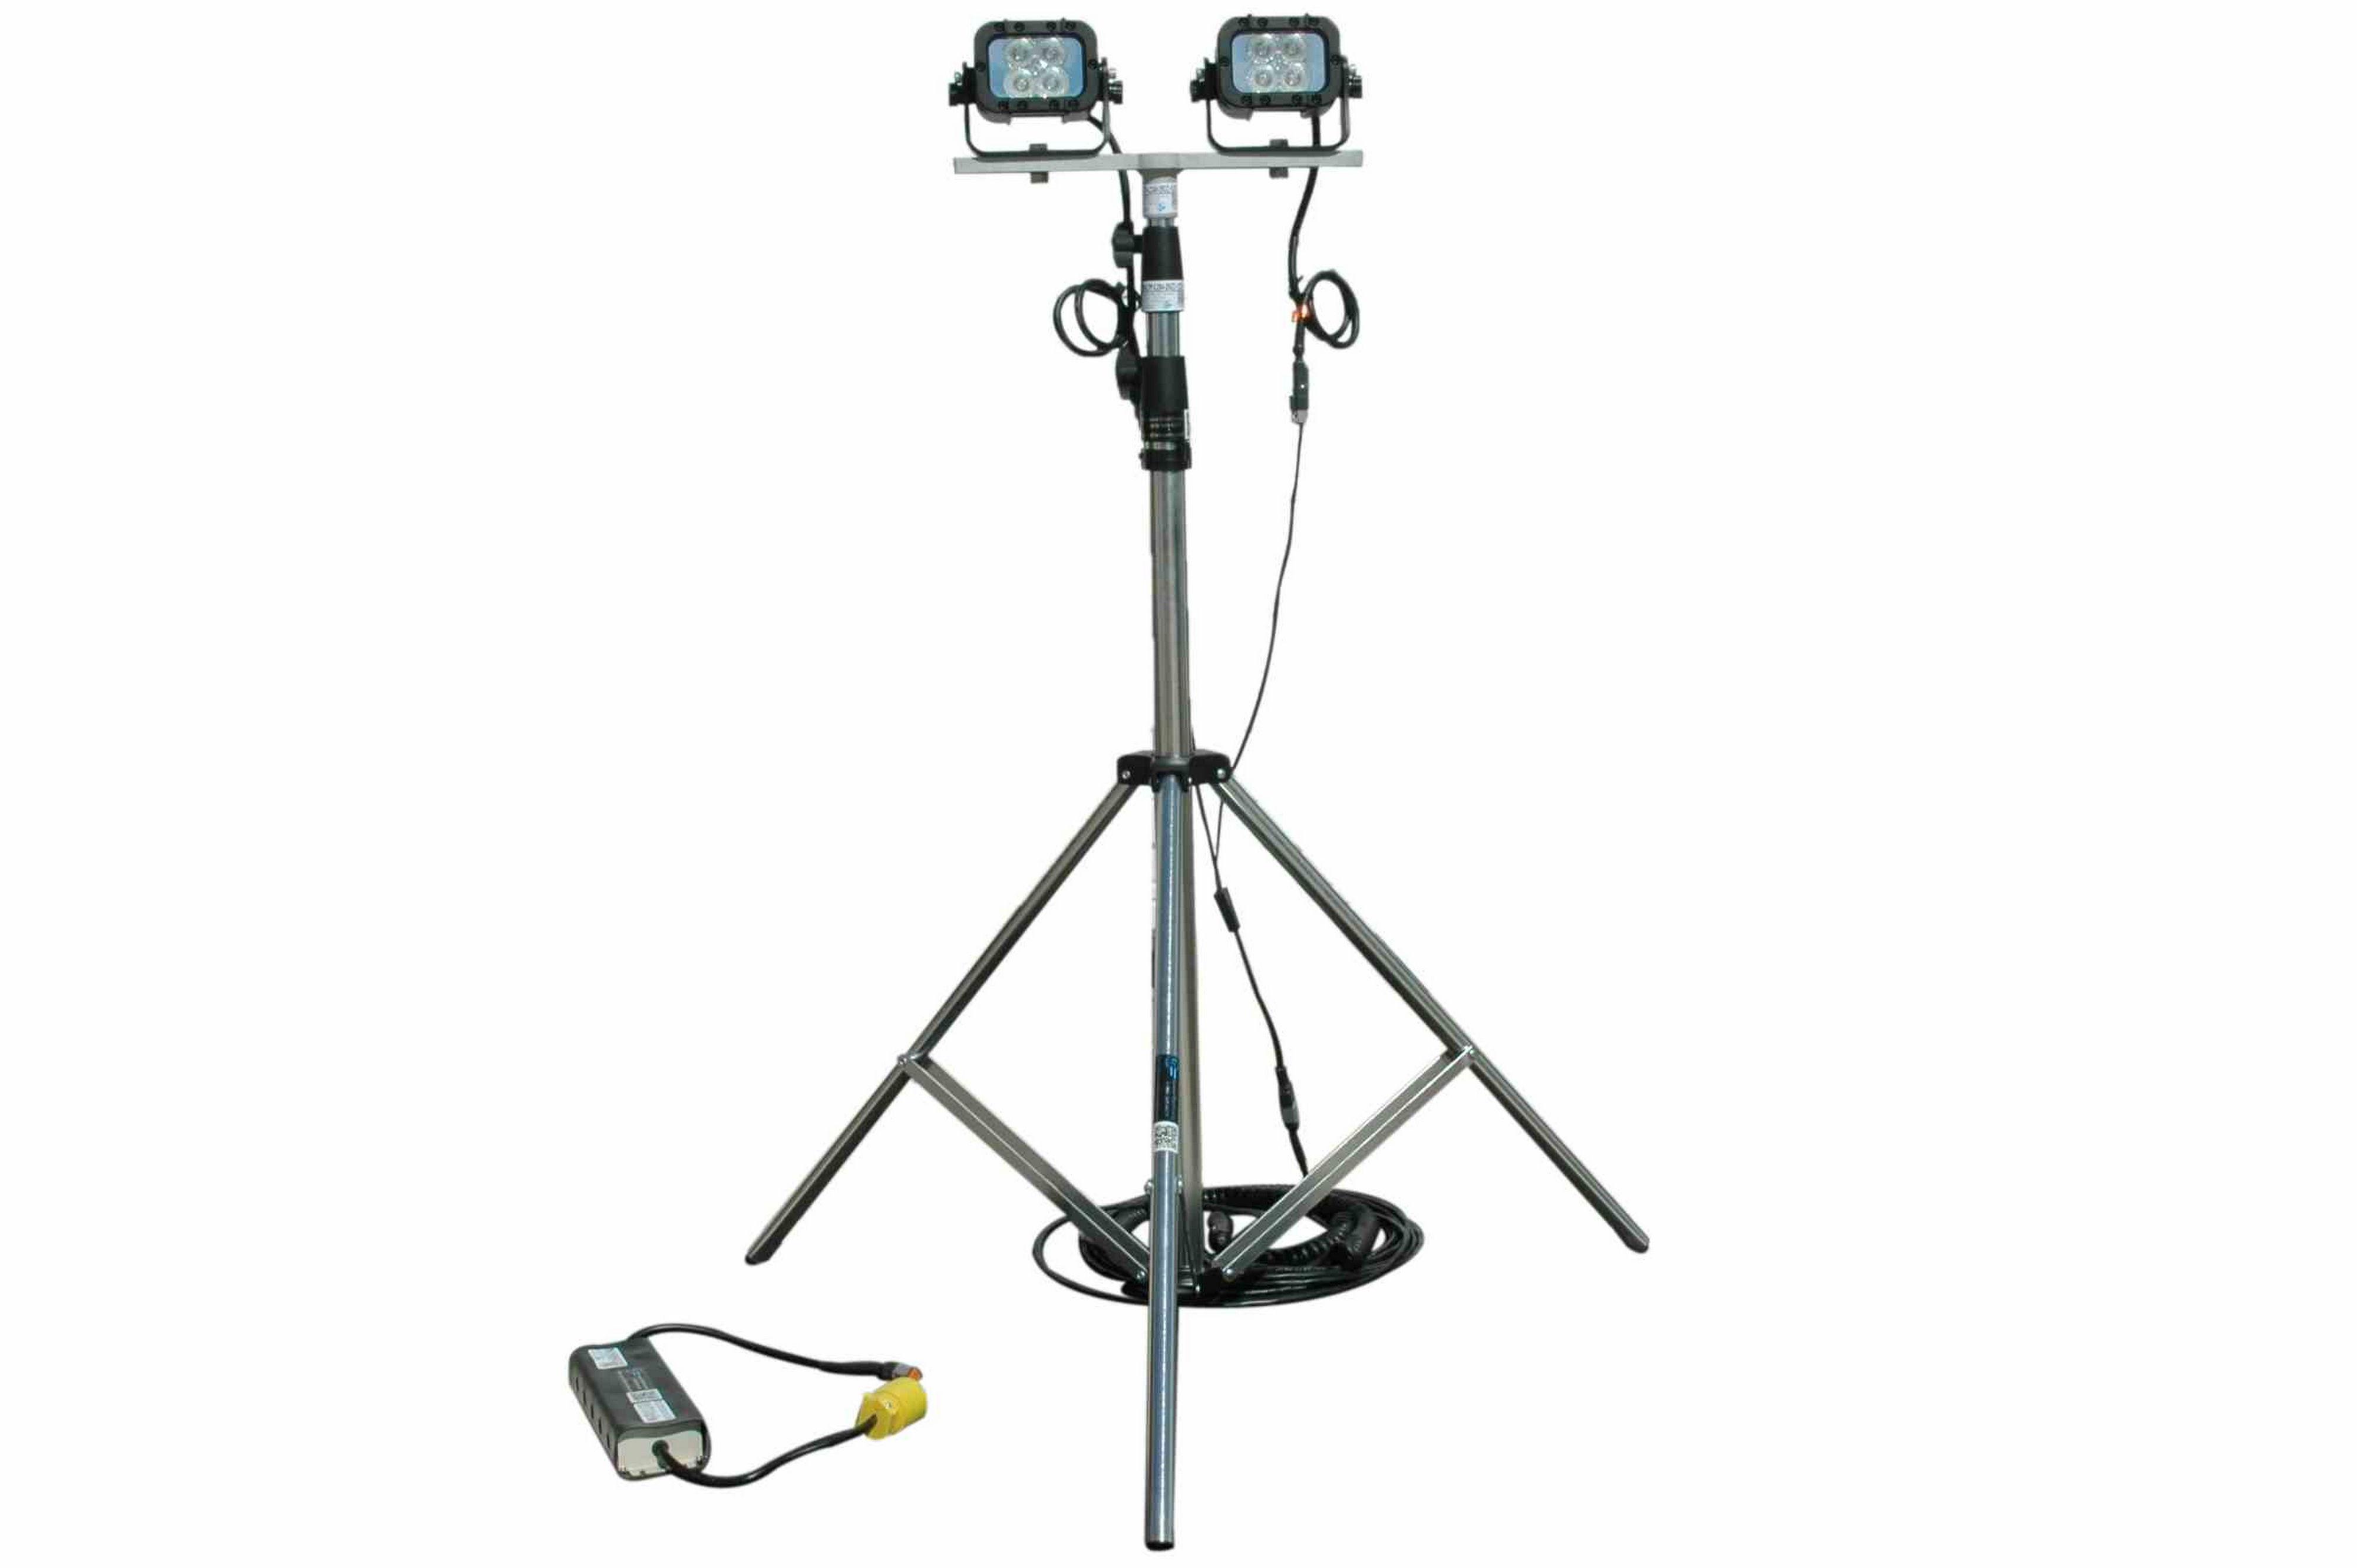 24 Watt Portable Led Telescoping Light Tower